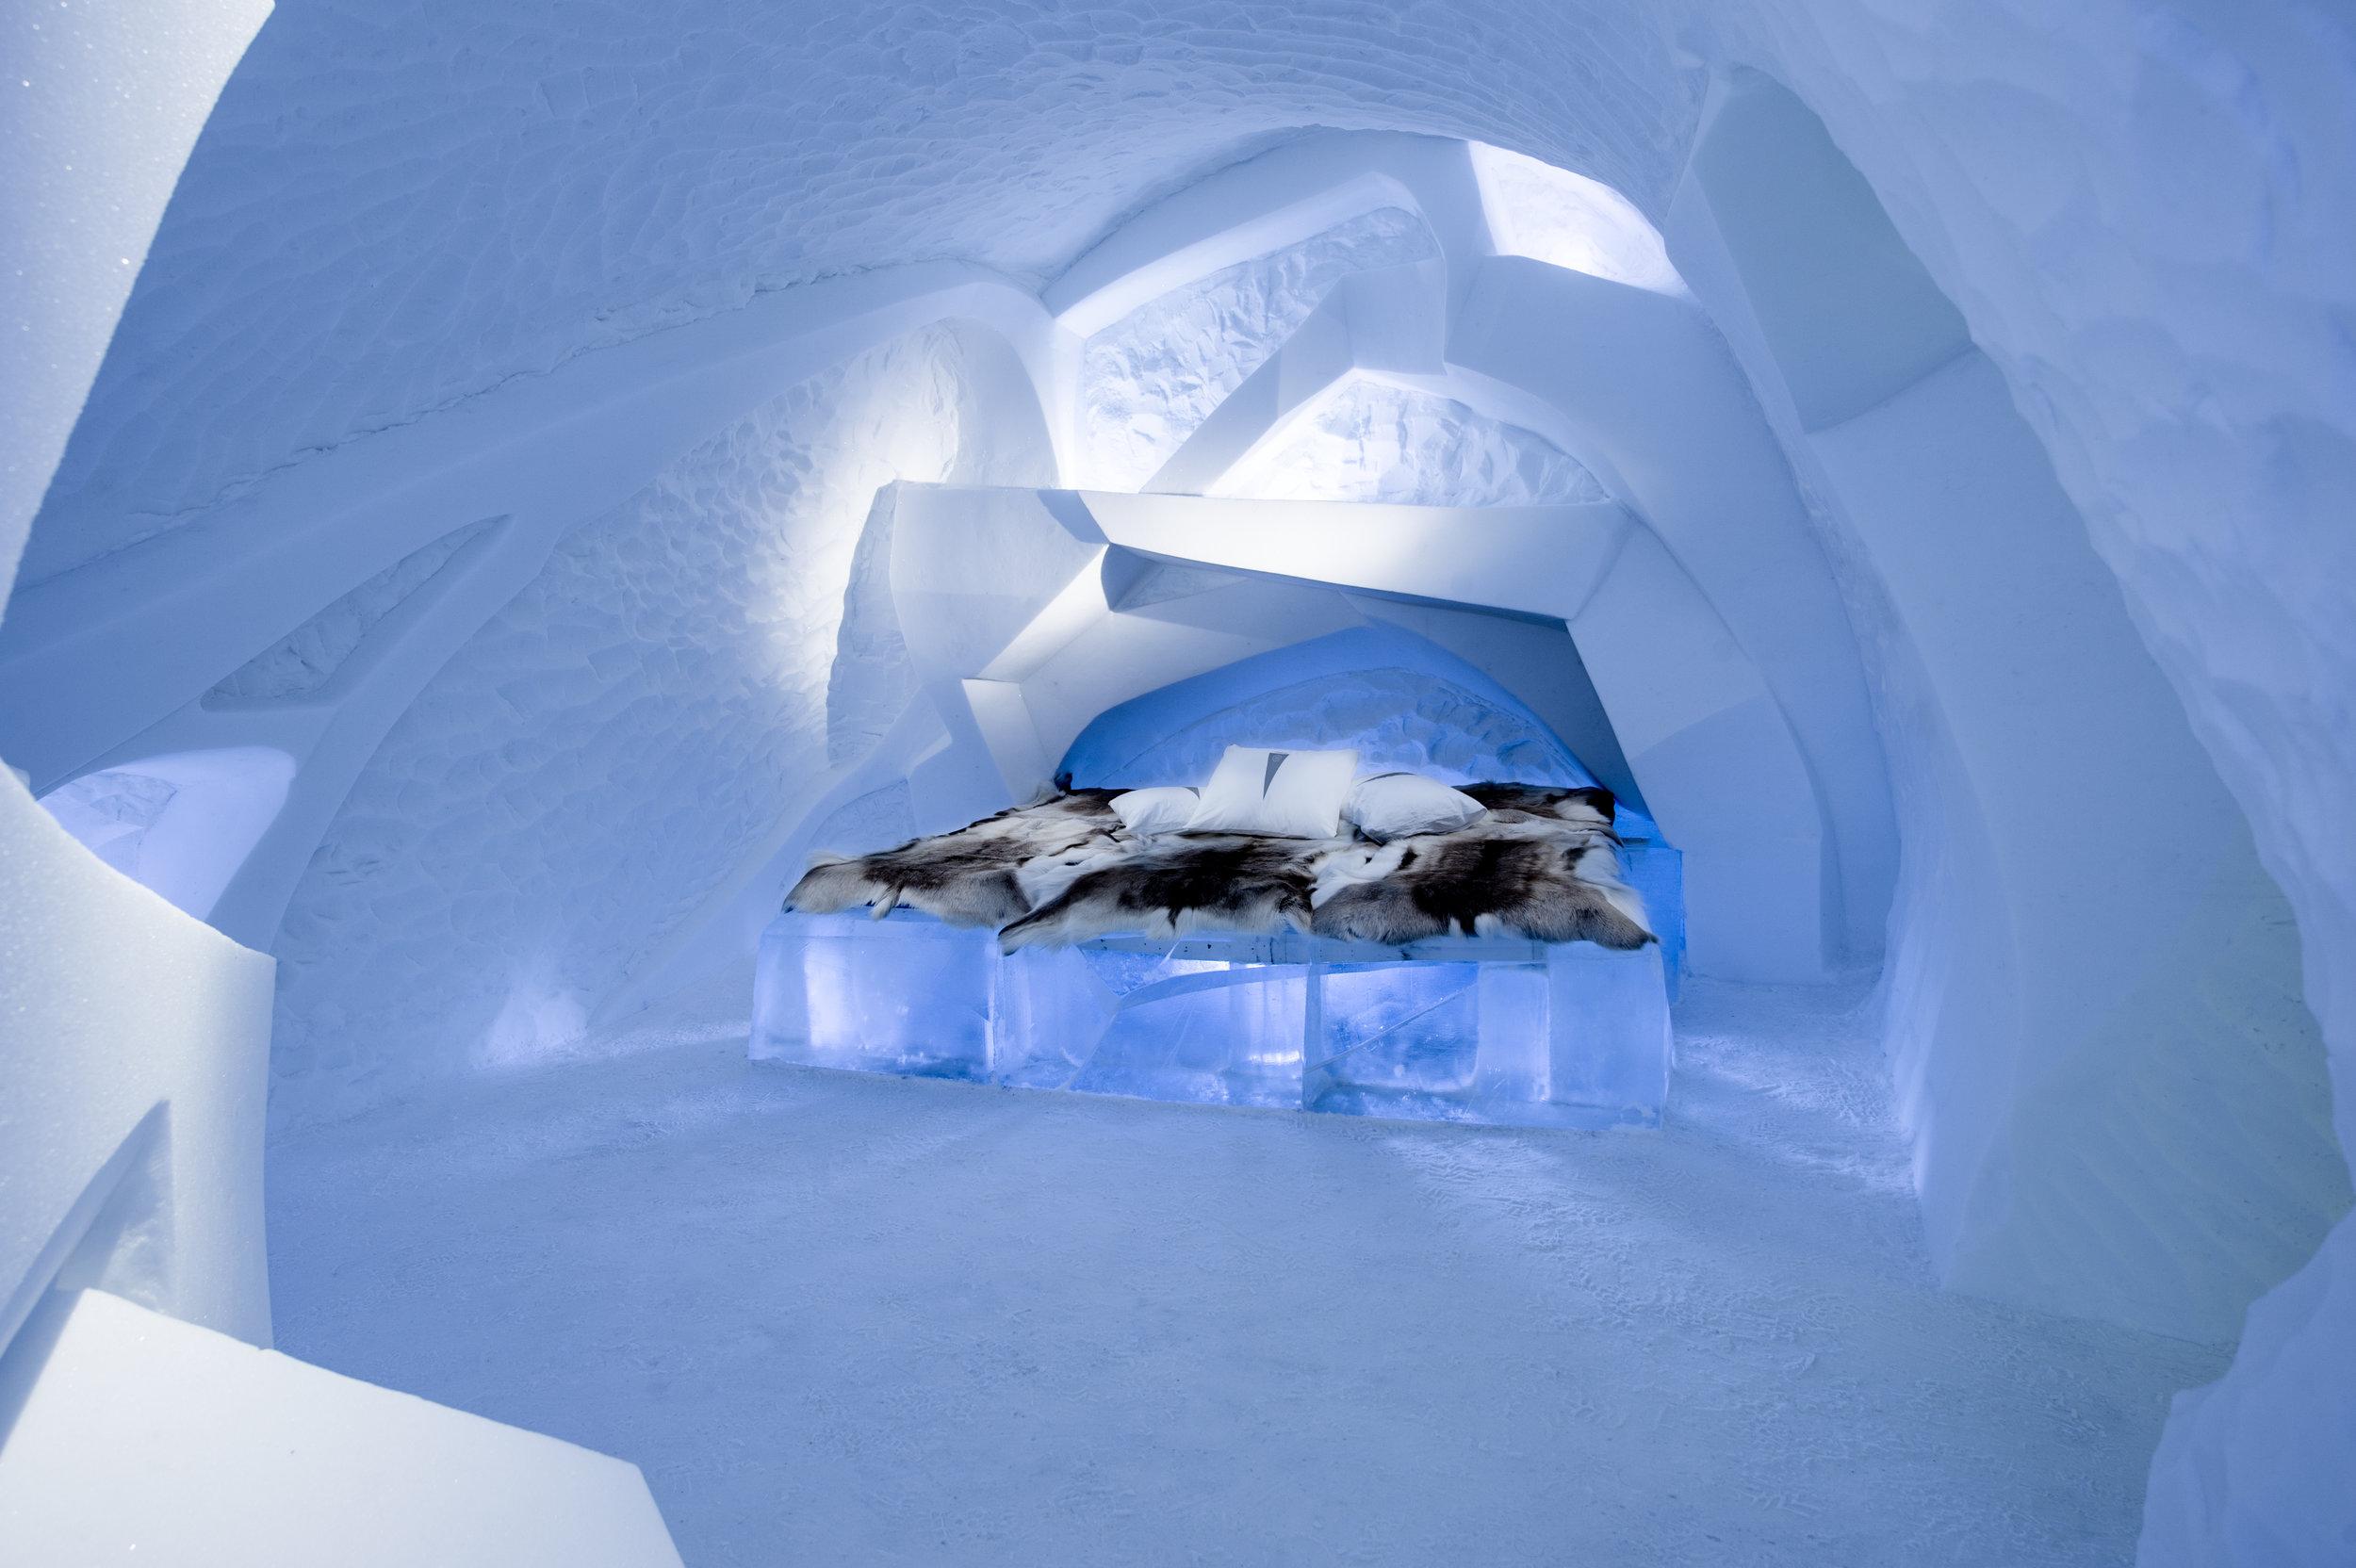 Art suite - Livoq-Fabien Champeval & Friederike Schroth-- ICEHOTEL 28  Photo by - Asaf Kliger.jpg